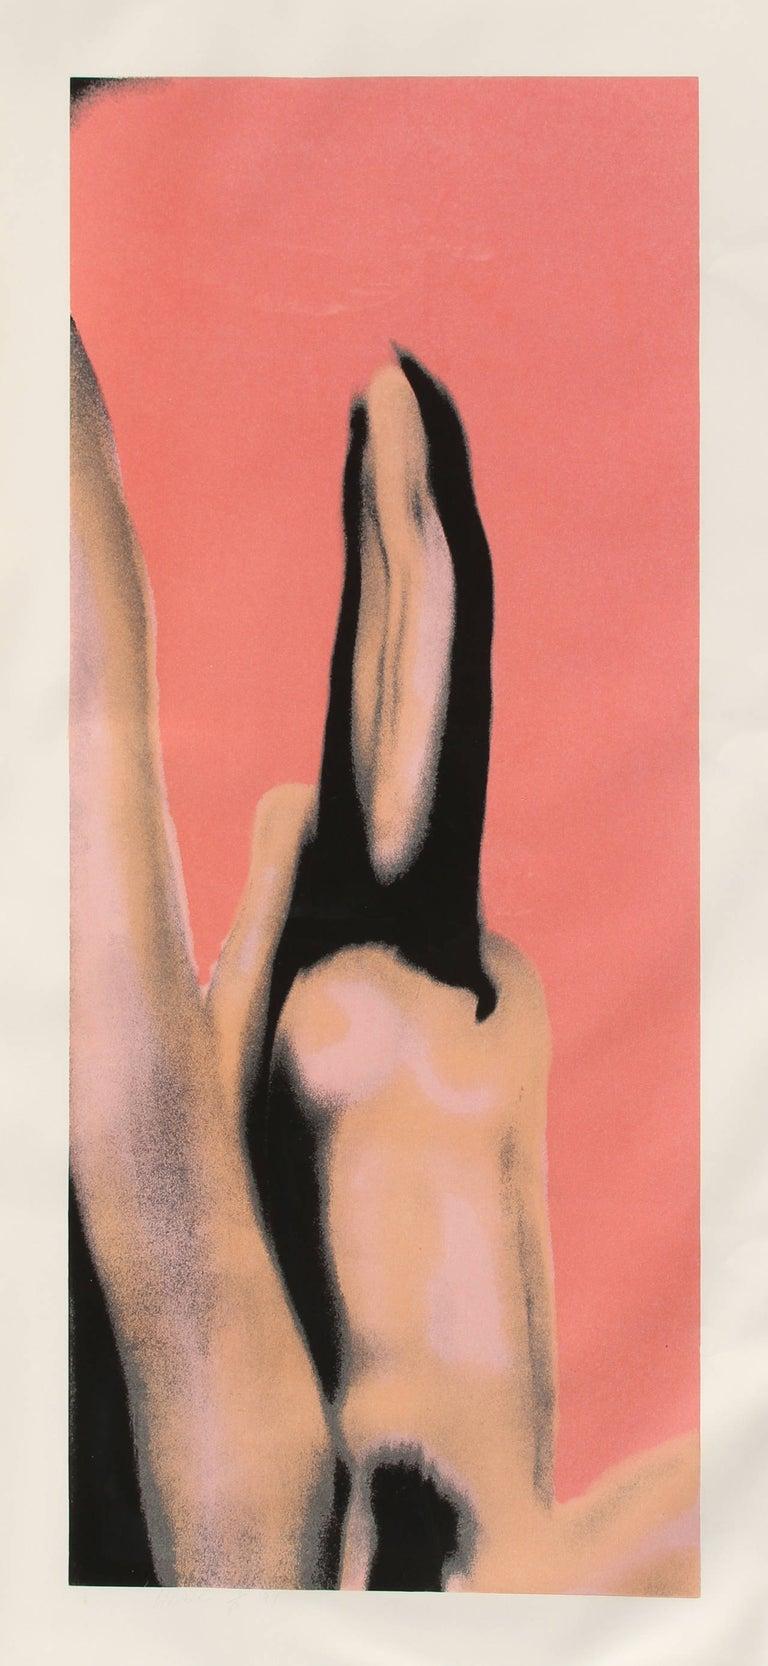 Larry Bell Nude Print - Nude 1